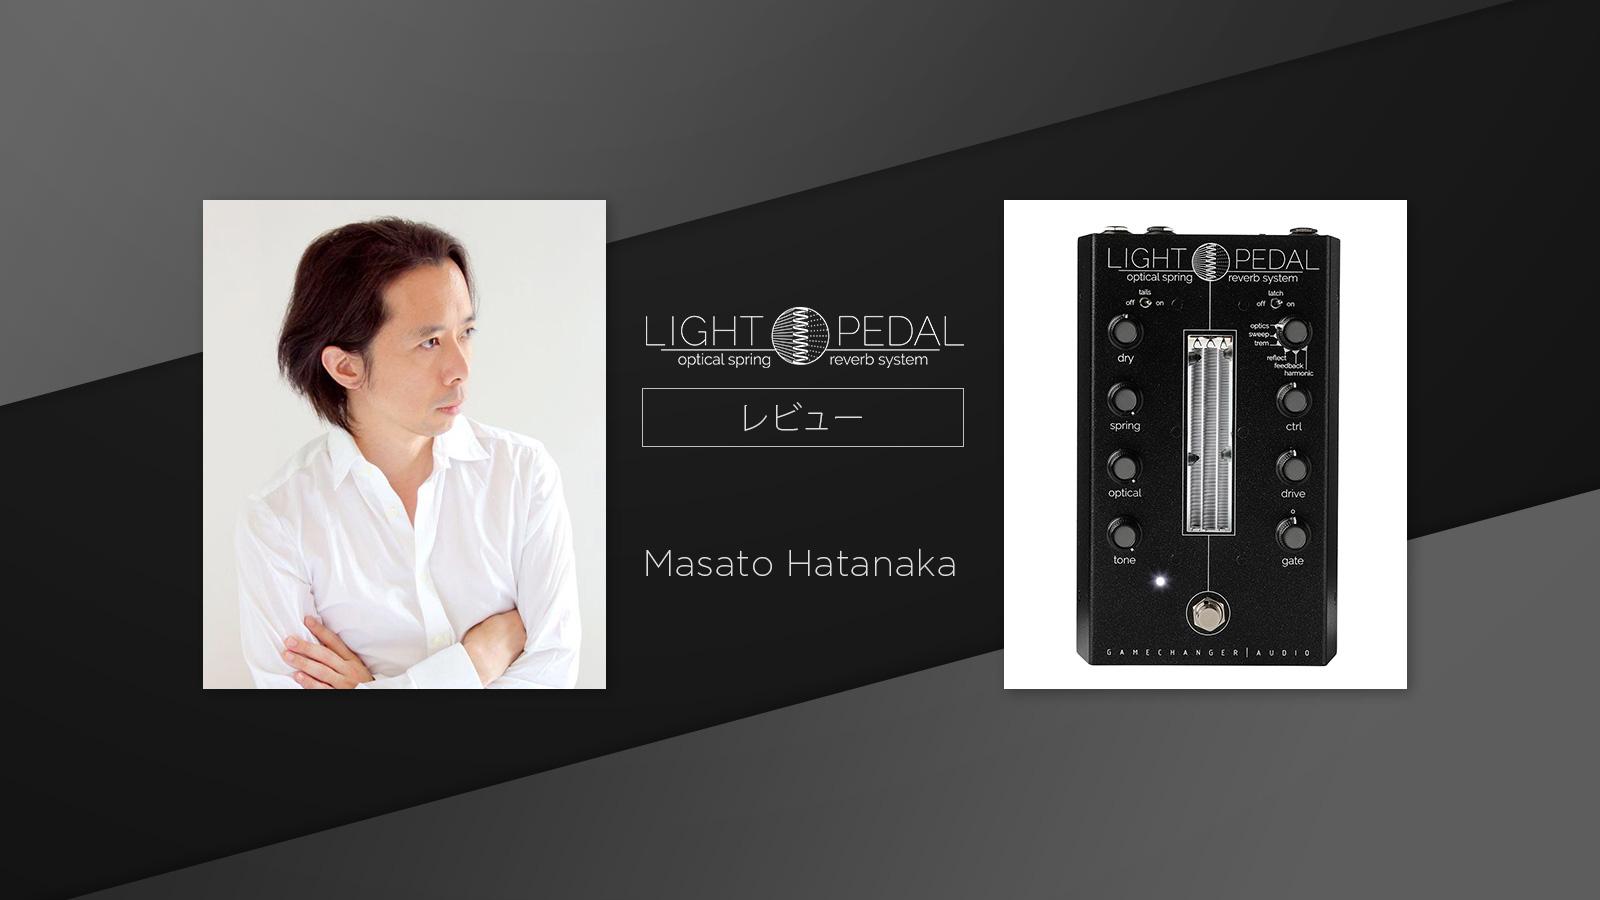 Light Pedal 製品レビュー : Masato Hatanaka